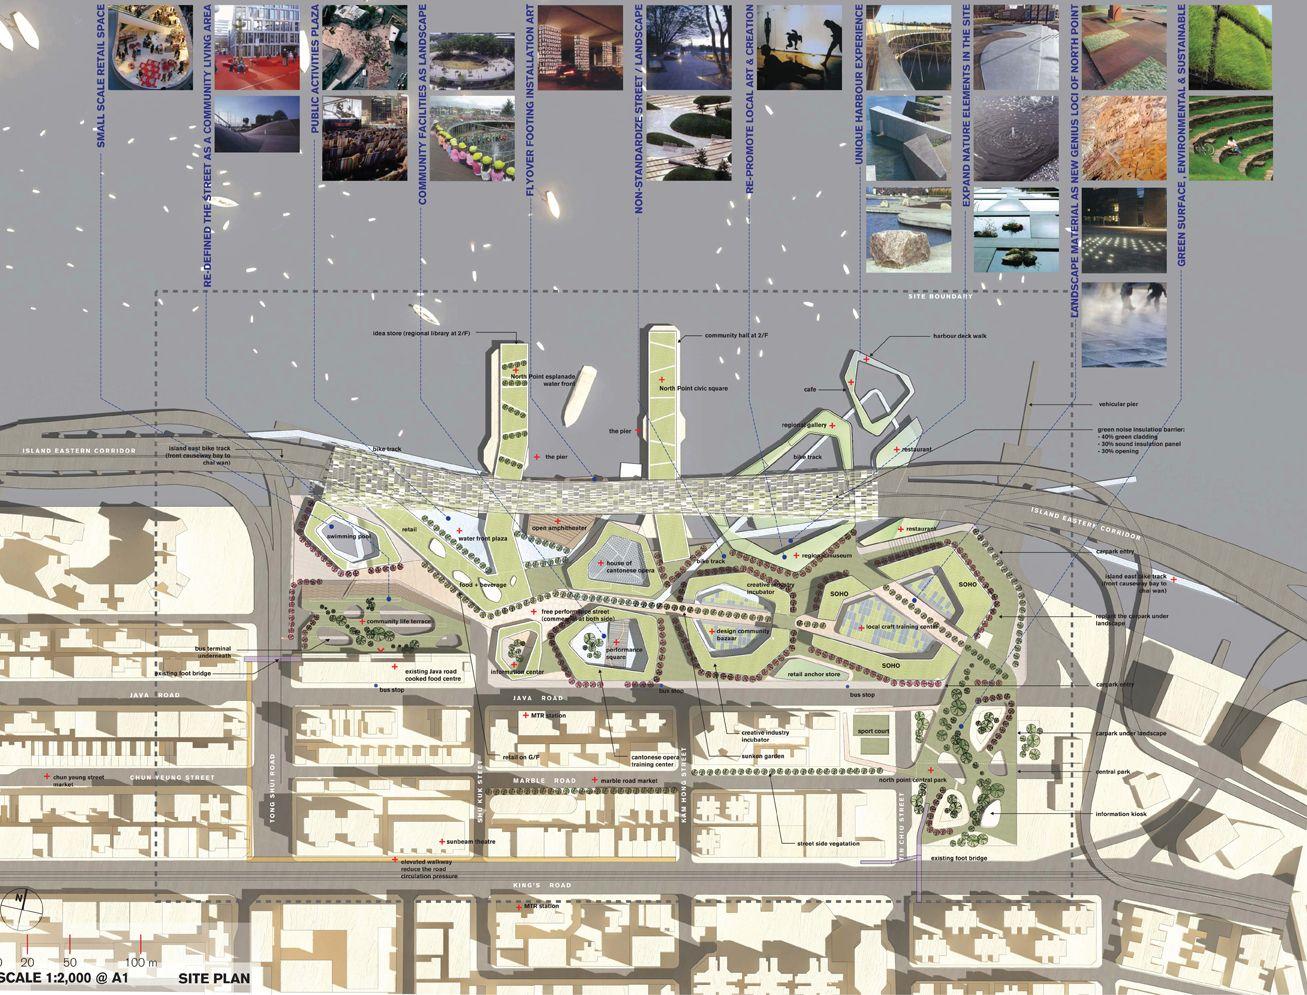 Pin by Rosa Aparici on LWK | Urban planning, Urban design